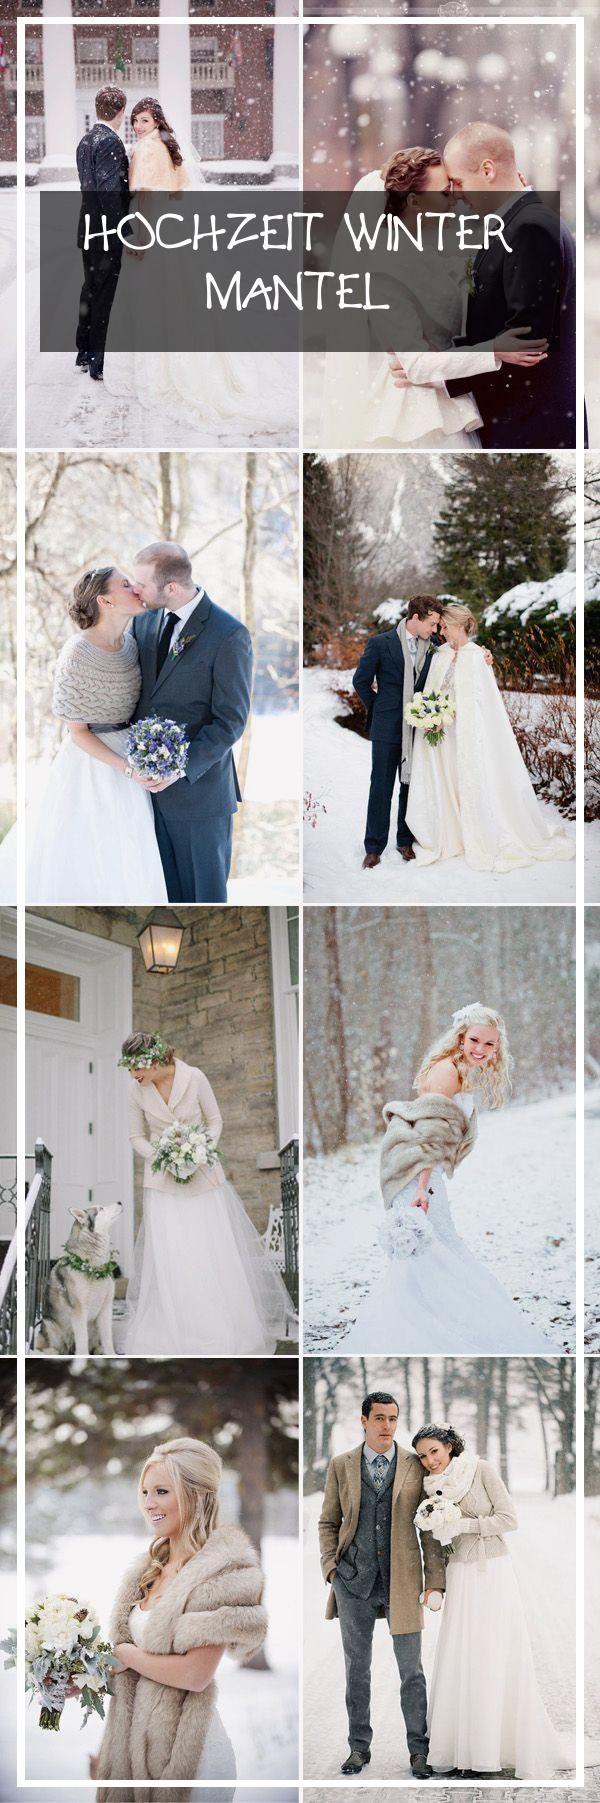 Large 17 Hochzeit Winter Mantel Di 2020 Pernikahan Fotografi